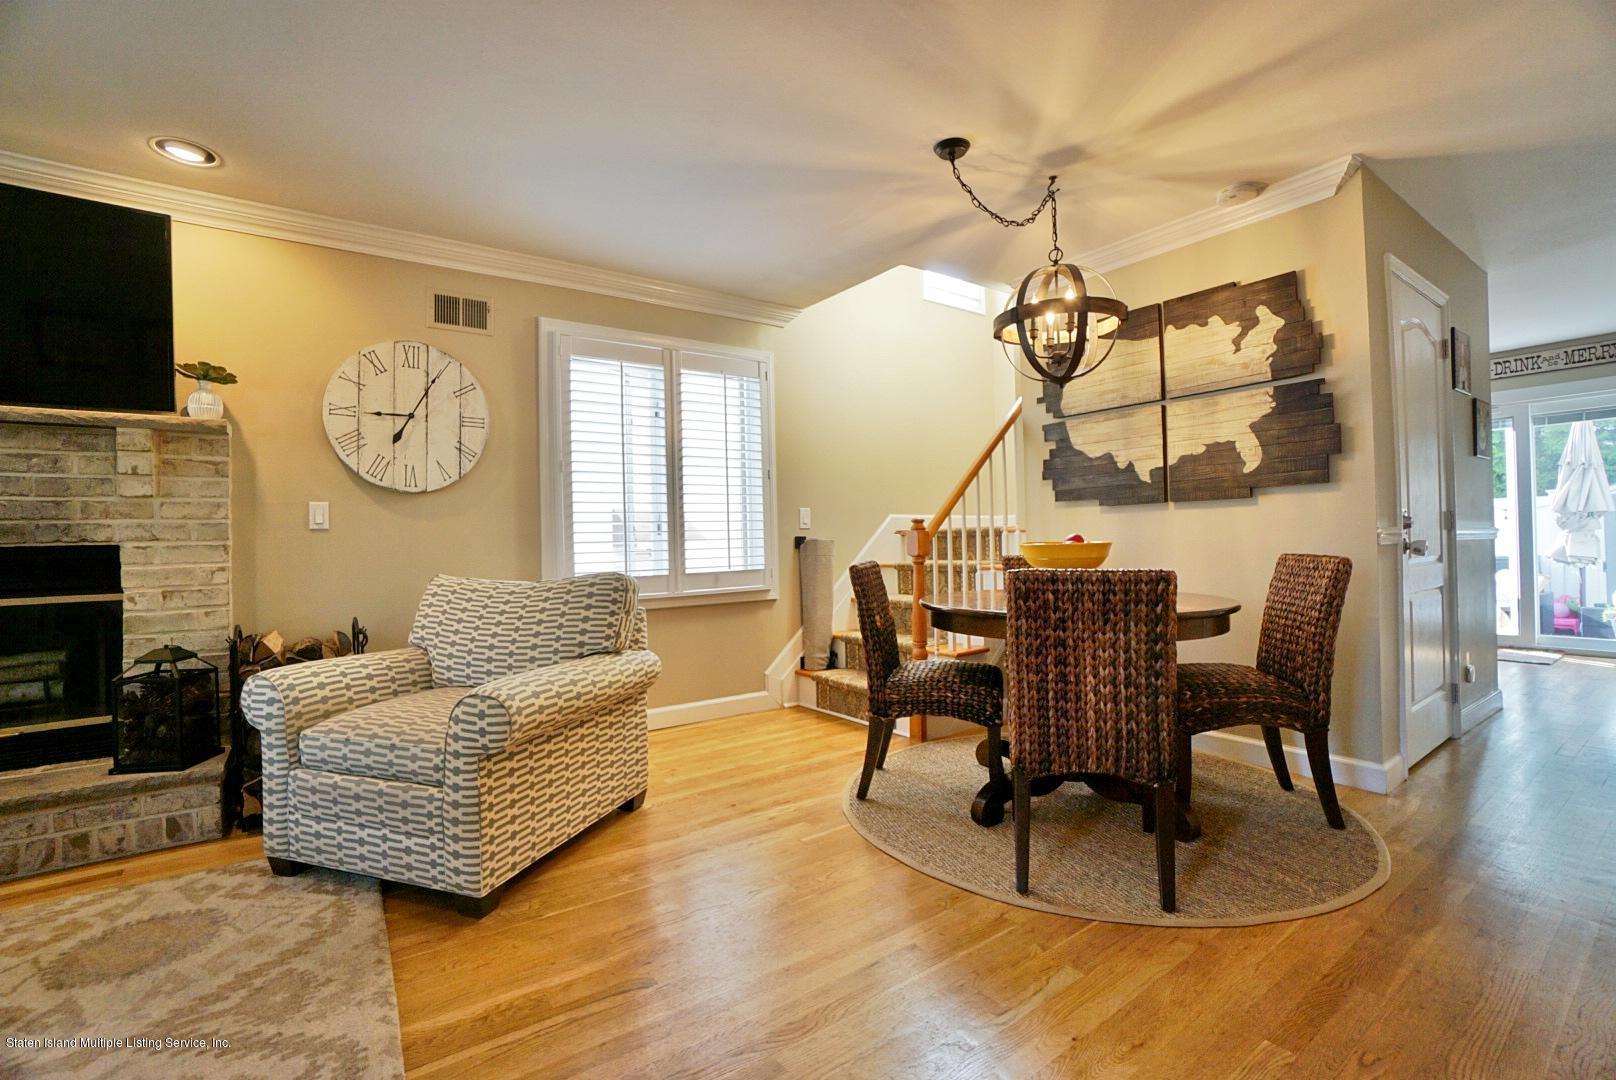 Single Family - Semi-Attached 66 Reading Avenue  Staten Island, NY 10312, MLS-1132256-5